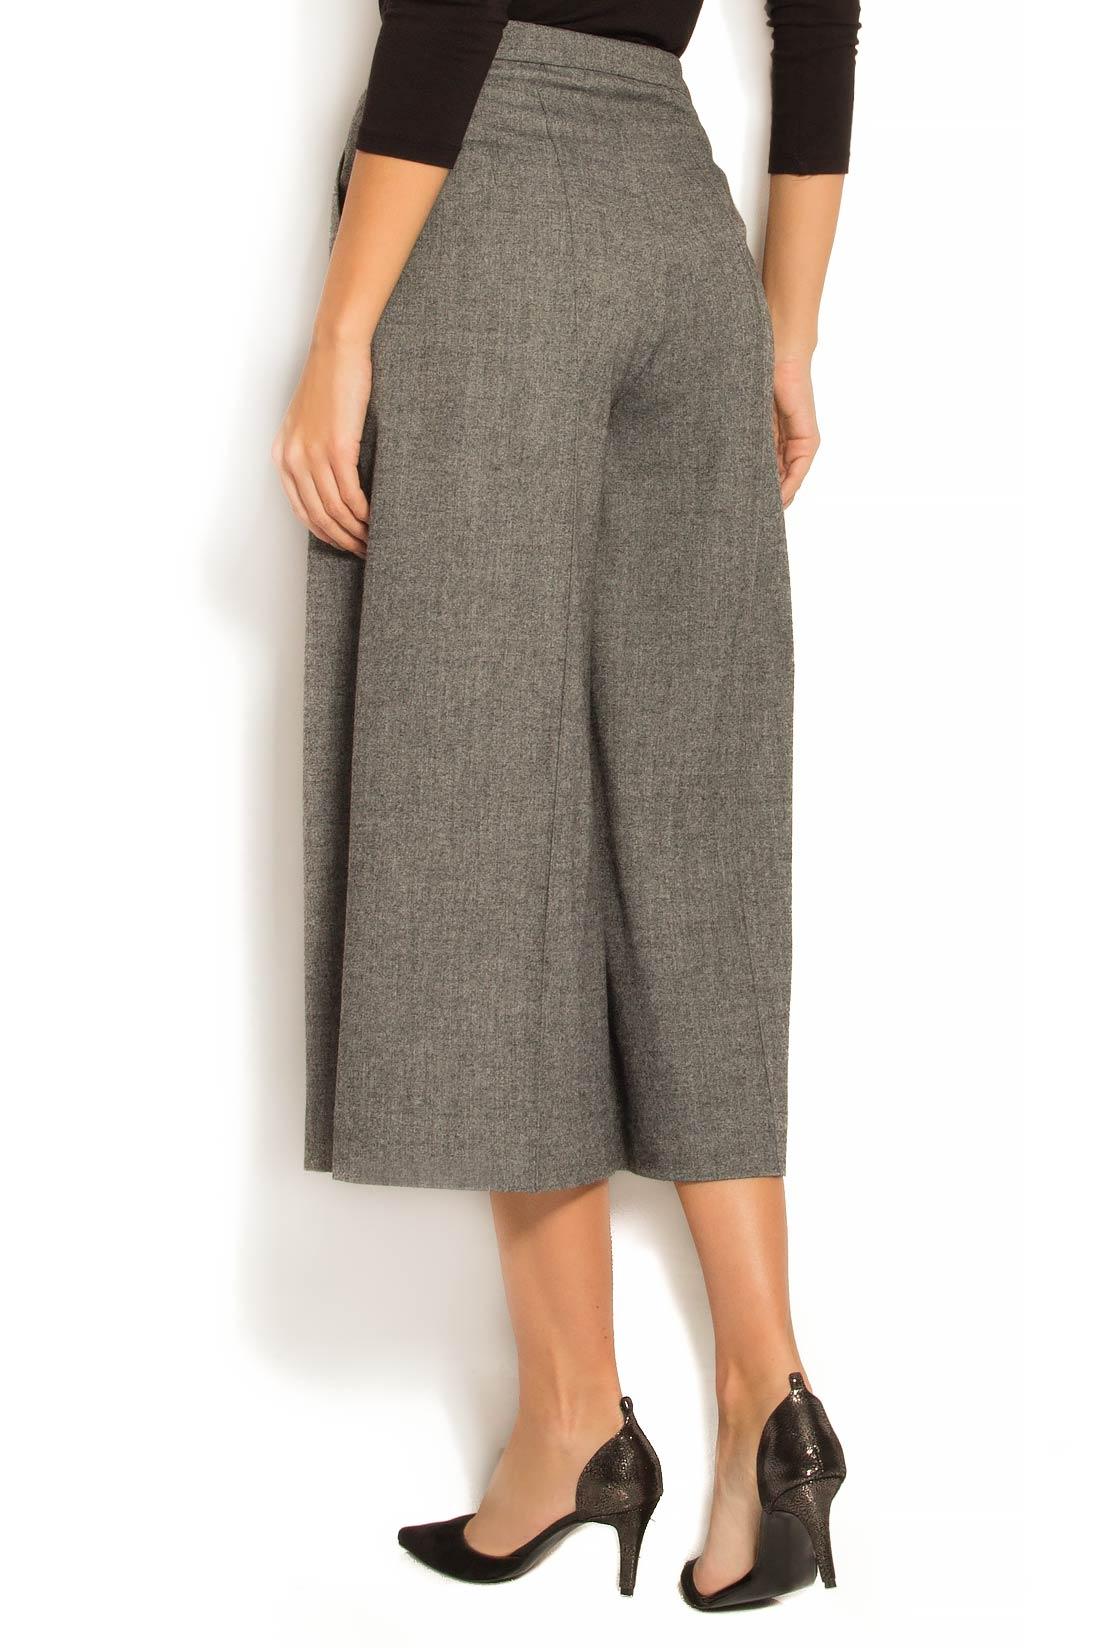 Pantaloni culot din stofa de lana Lena Criveanu imagine 2